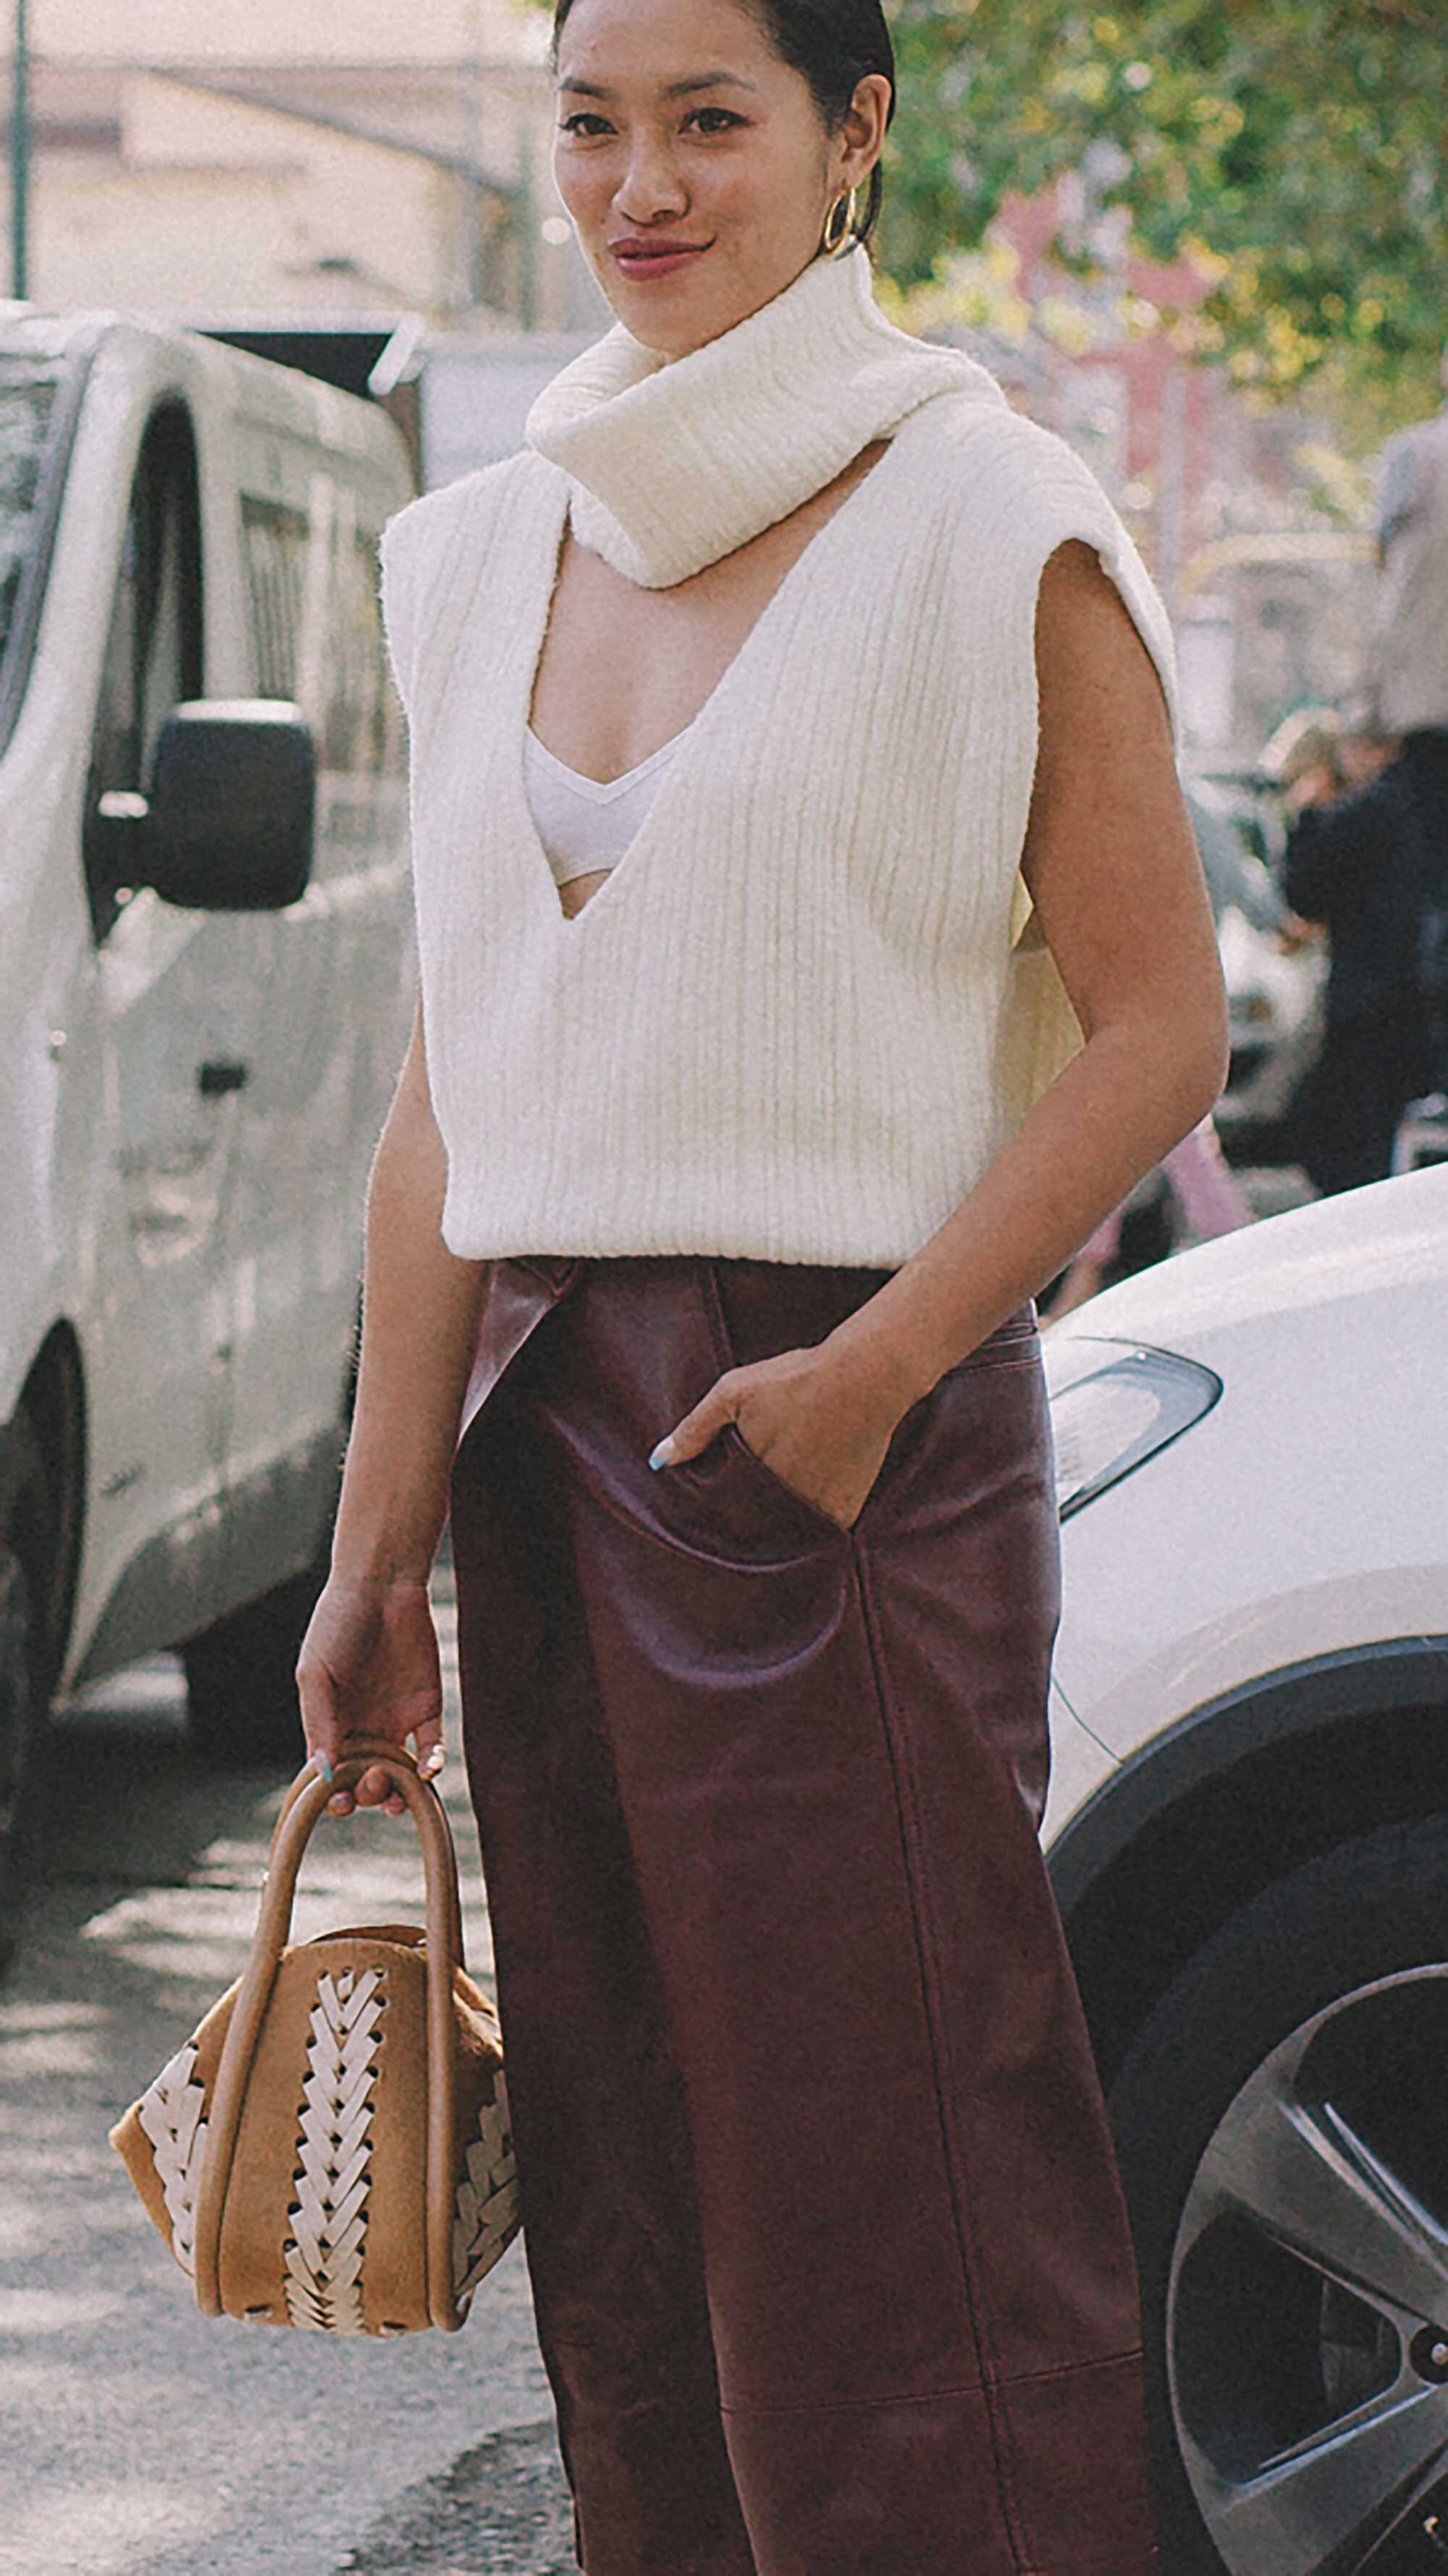 Best outfits of Milan Fashion Week street style 2019 day three MFW SS20 Photo by @J2martinez -72.jpg